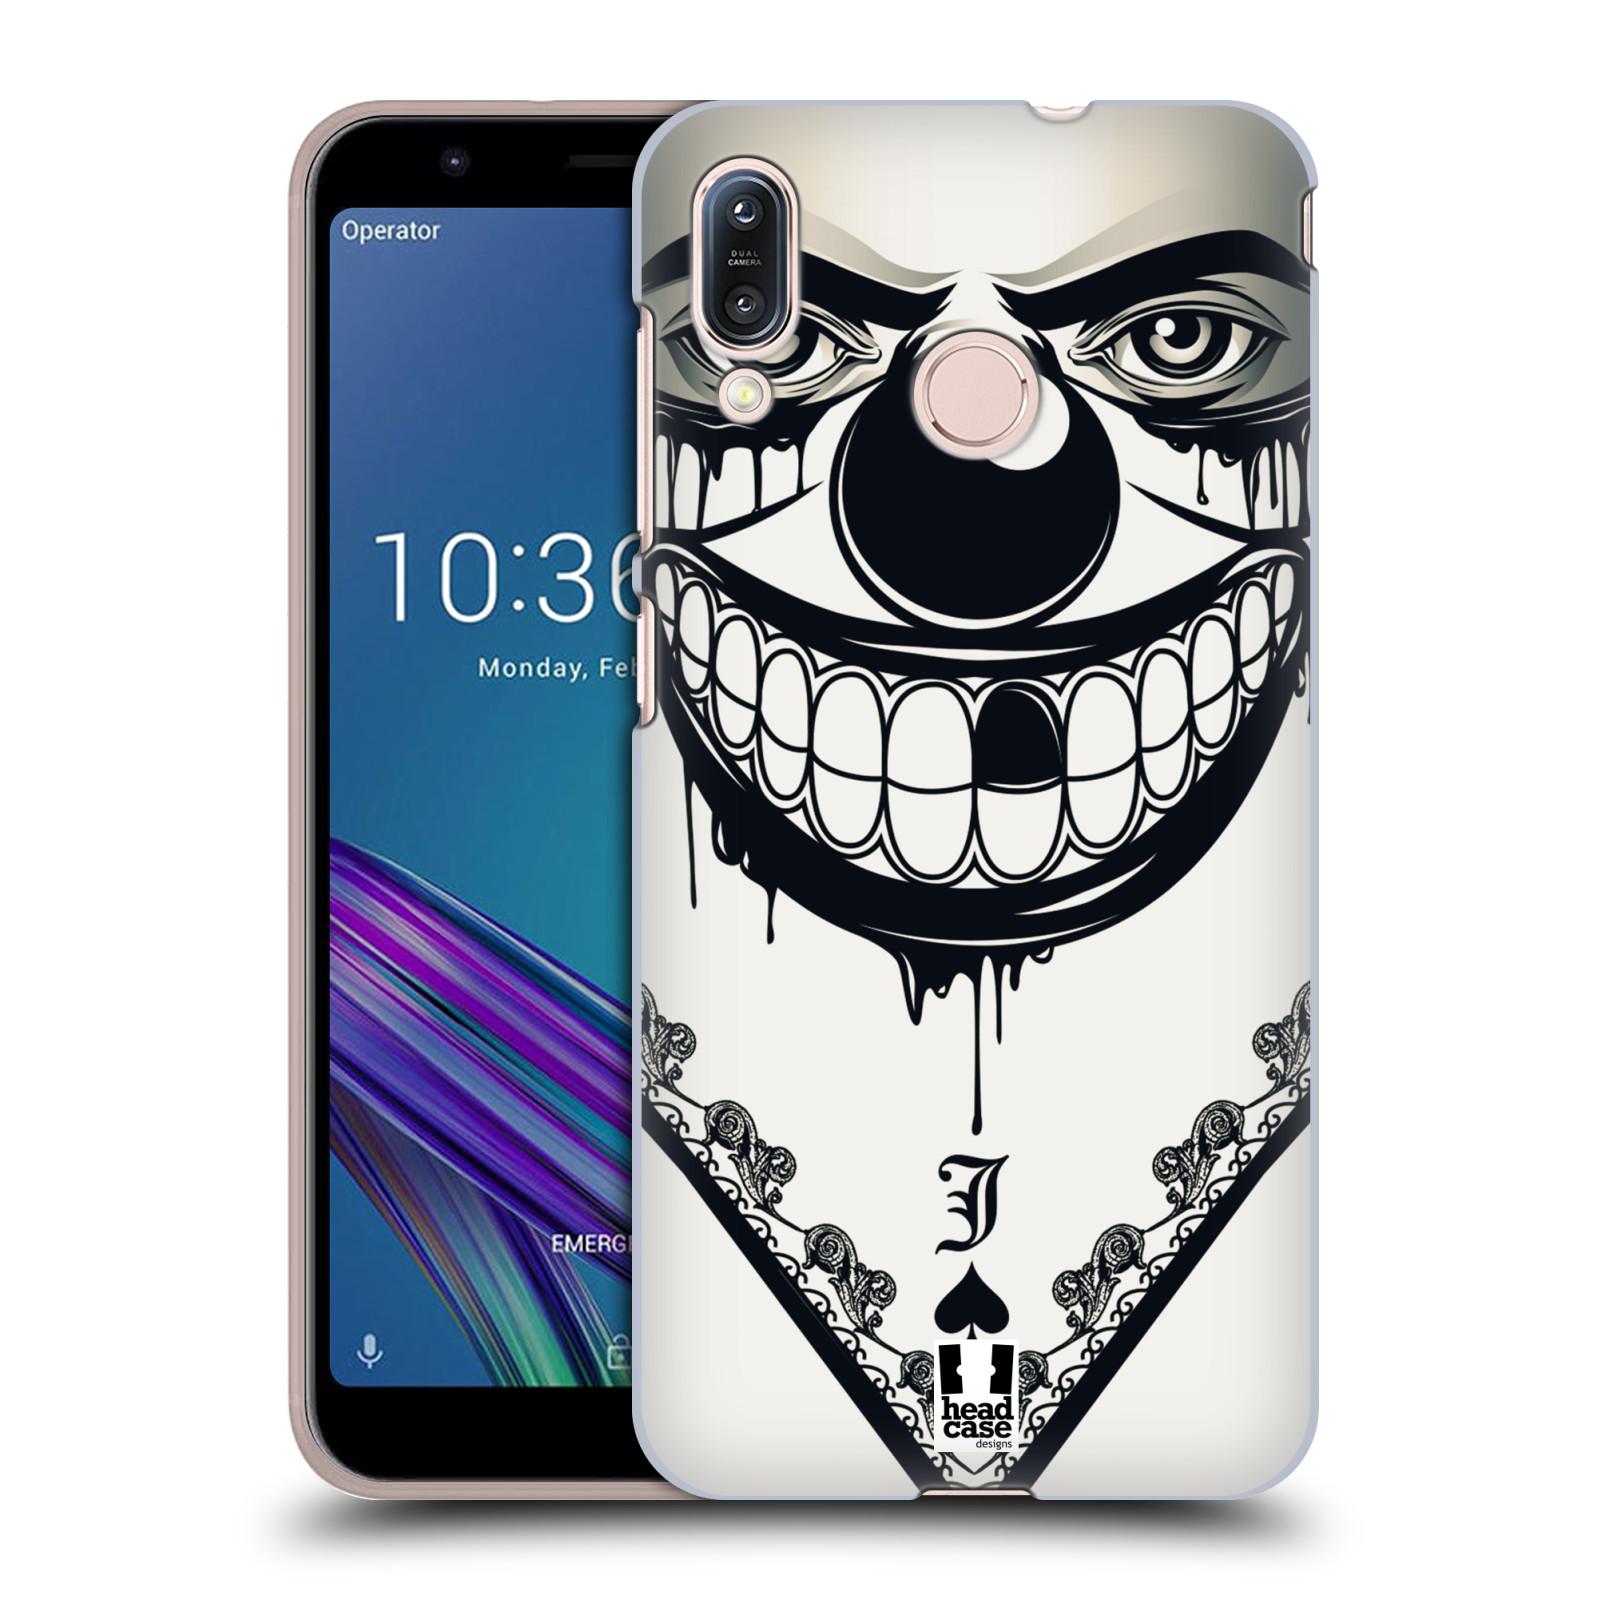 Plastové pouzdro na mobil Asus Zenfone Max M1 ZB555KL - Head Case - ZLEJ KLAUN